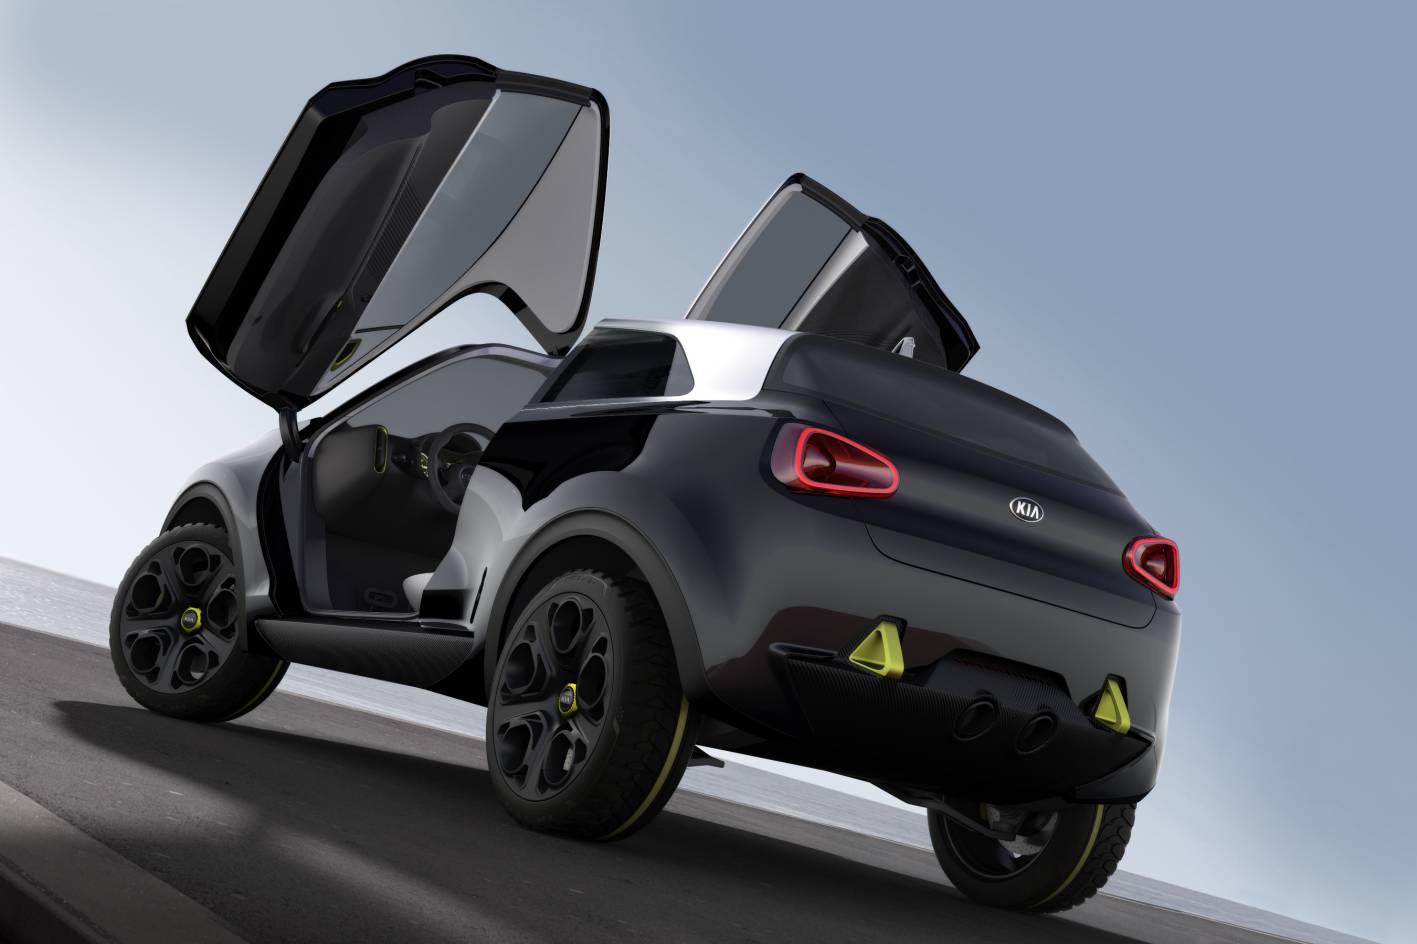 Kia Cars - News: Niro concept previews future city car